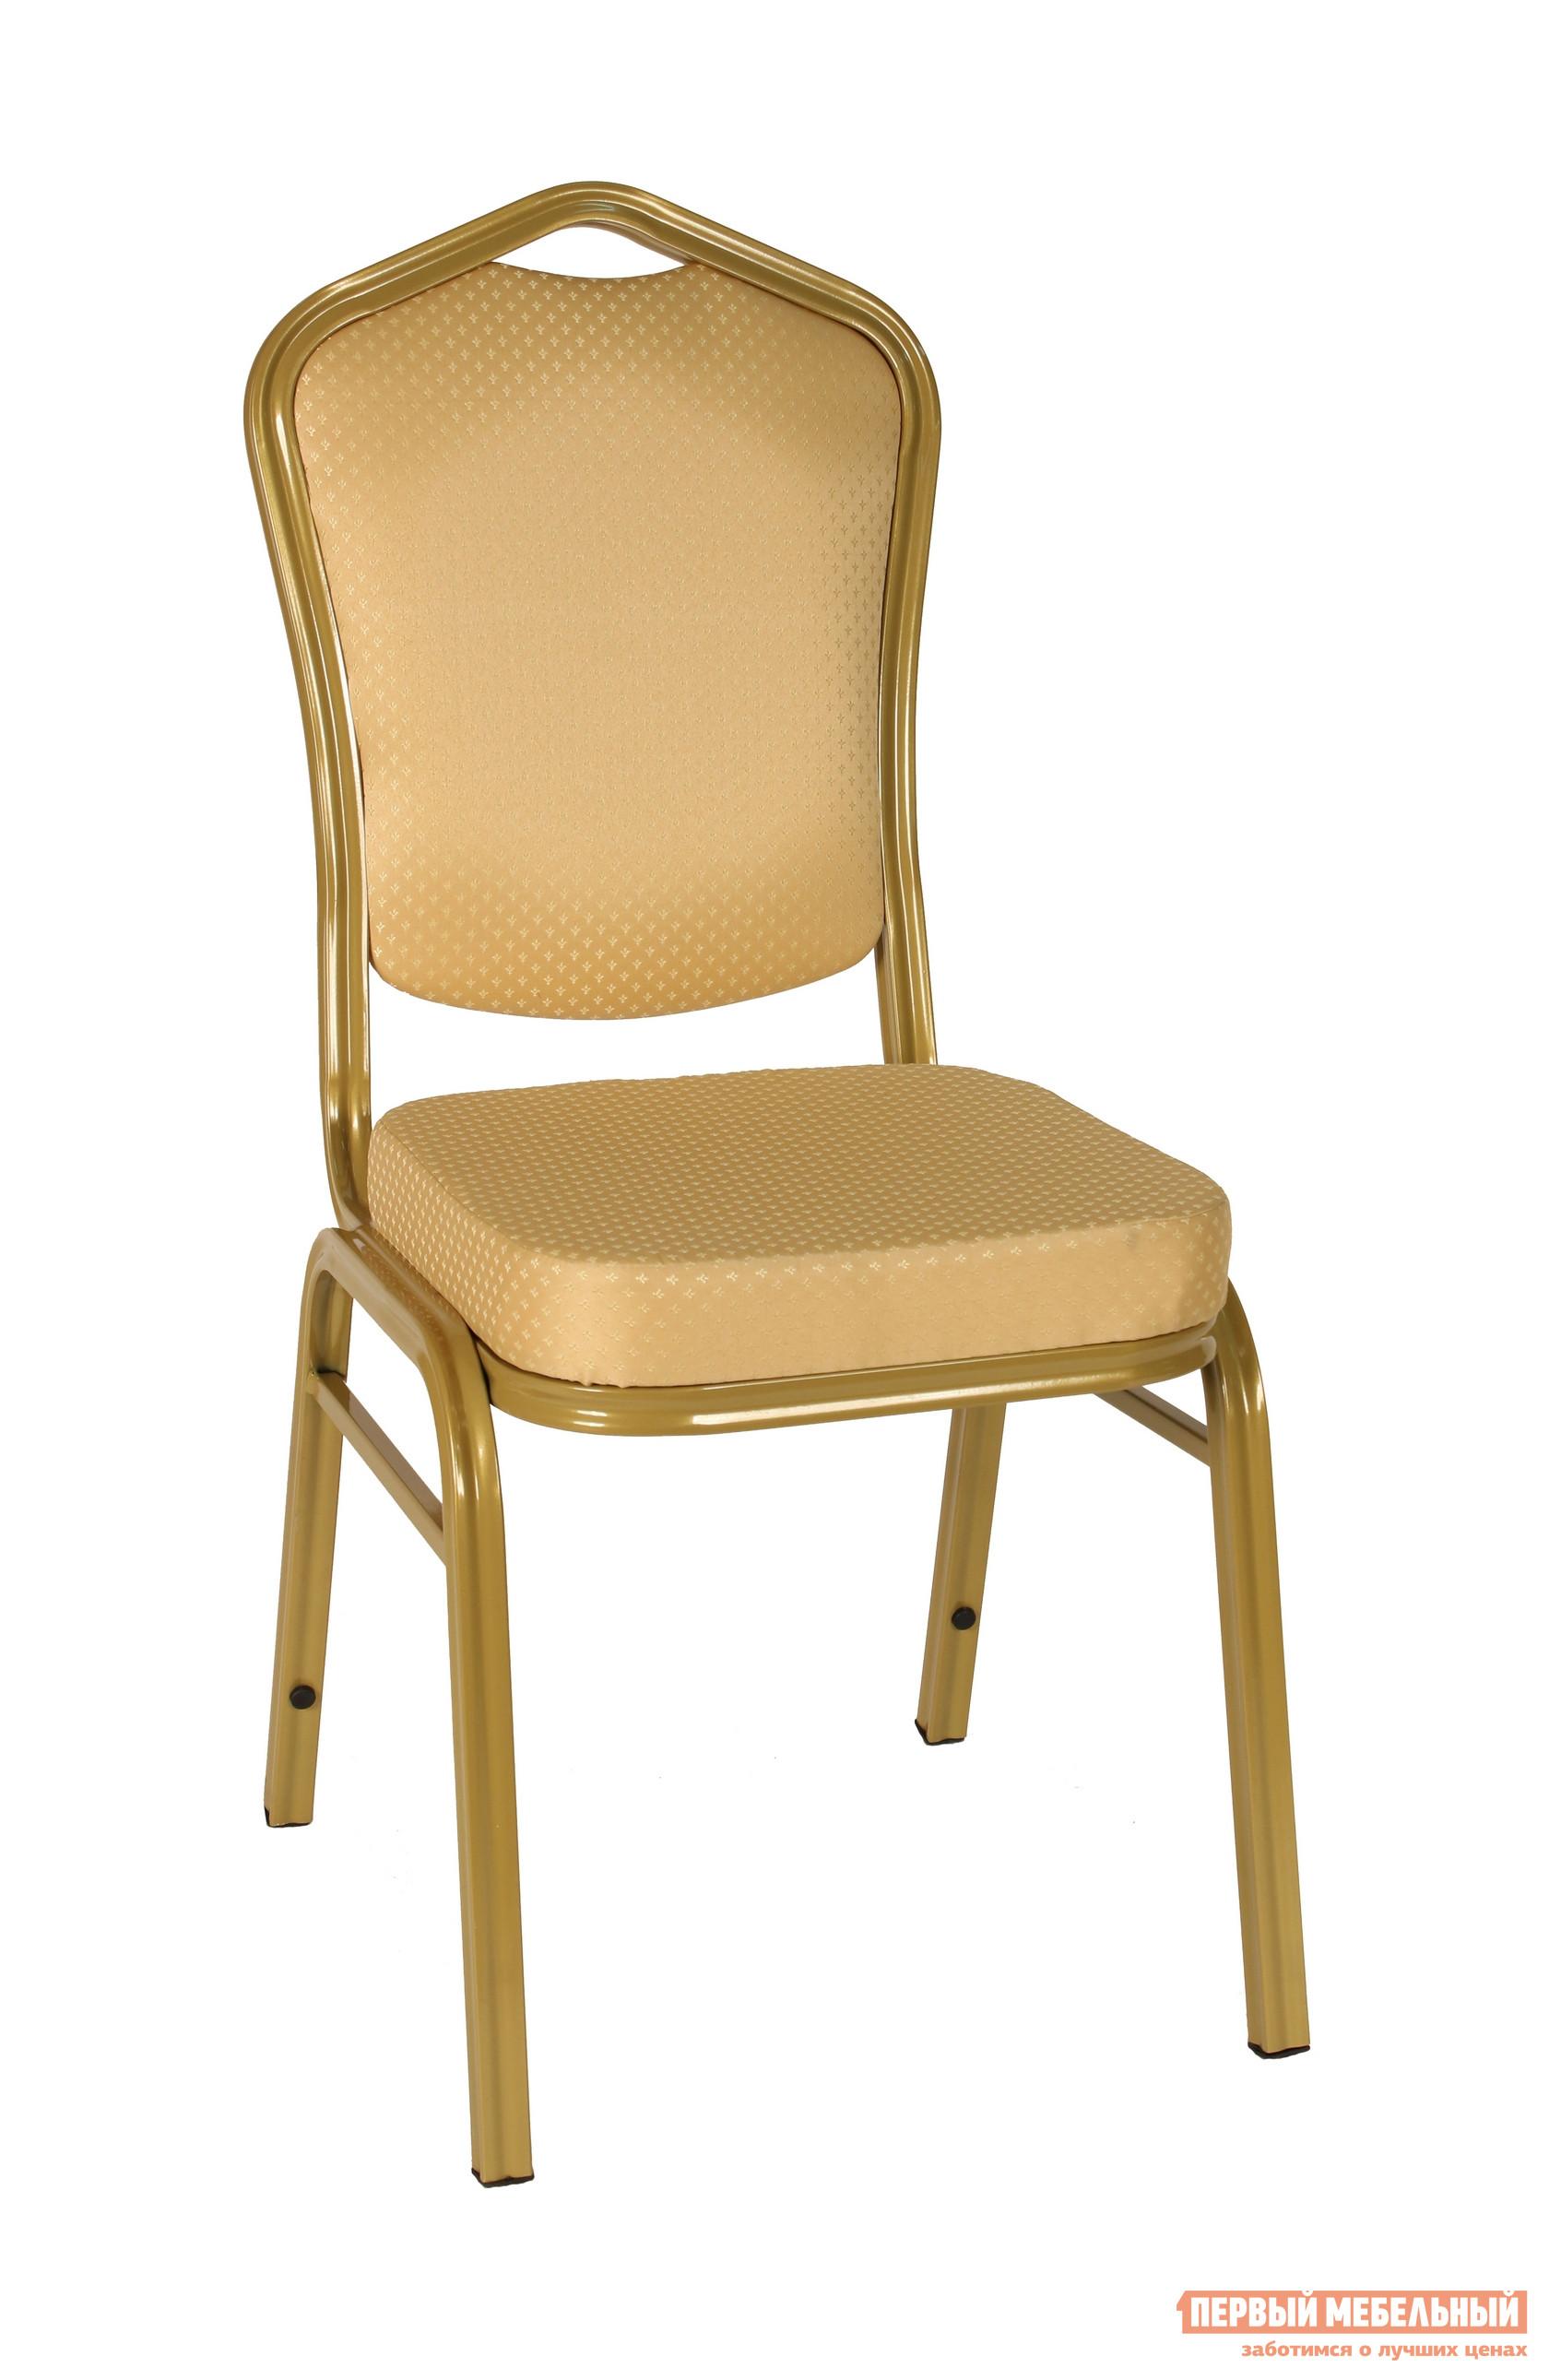 Кухонный стул STOOL GROUP Квадро Каркас золото / Обивка бежевая (узор короны) от Купистол